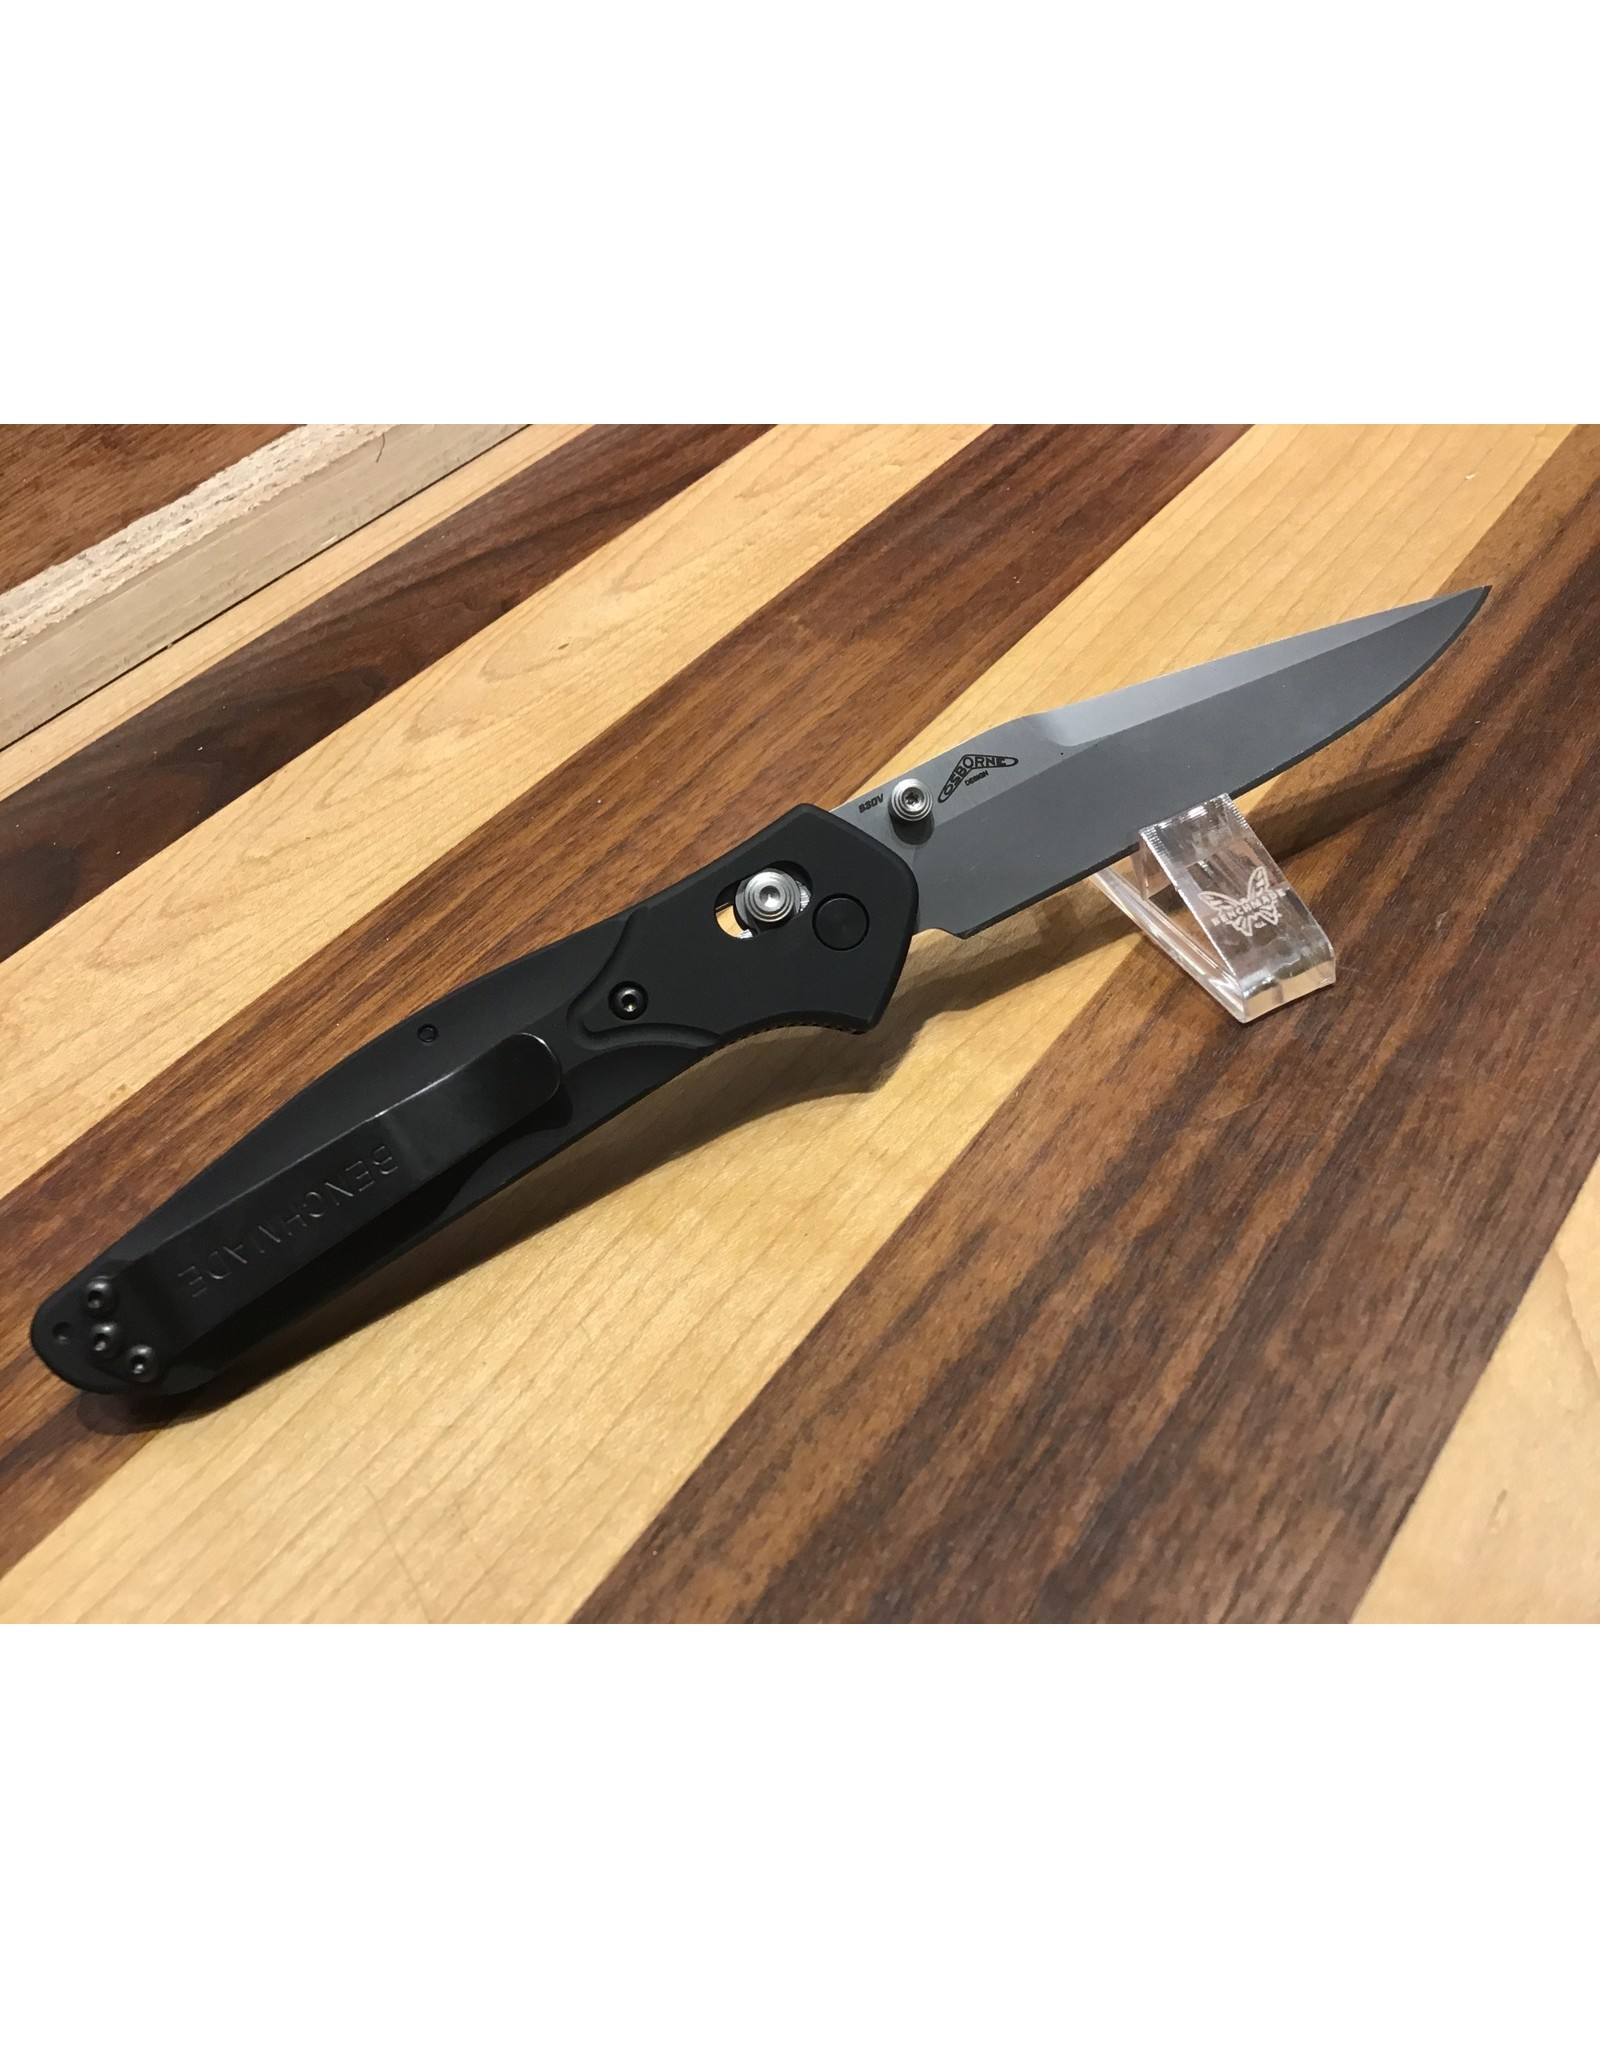 Benchmade Osborne 943  Drop Point Folding Knife